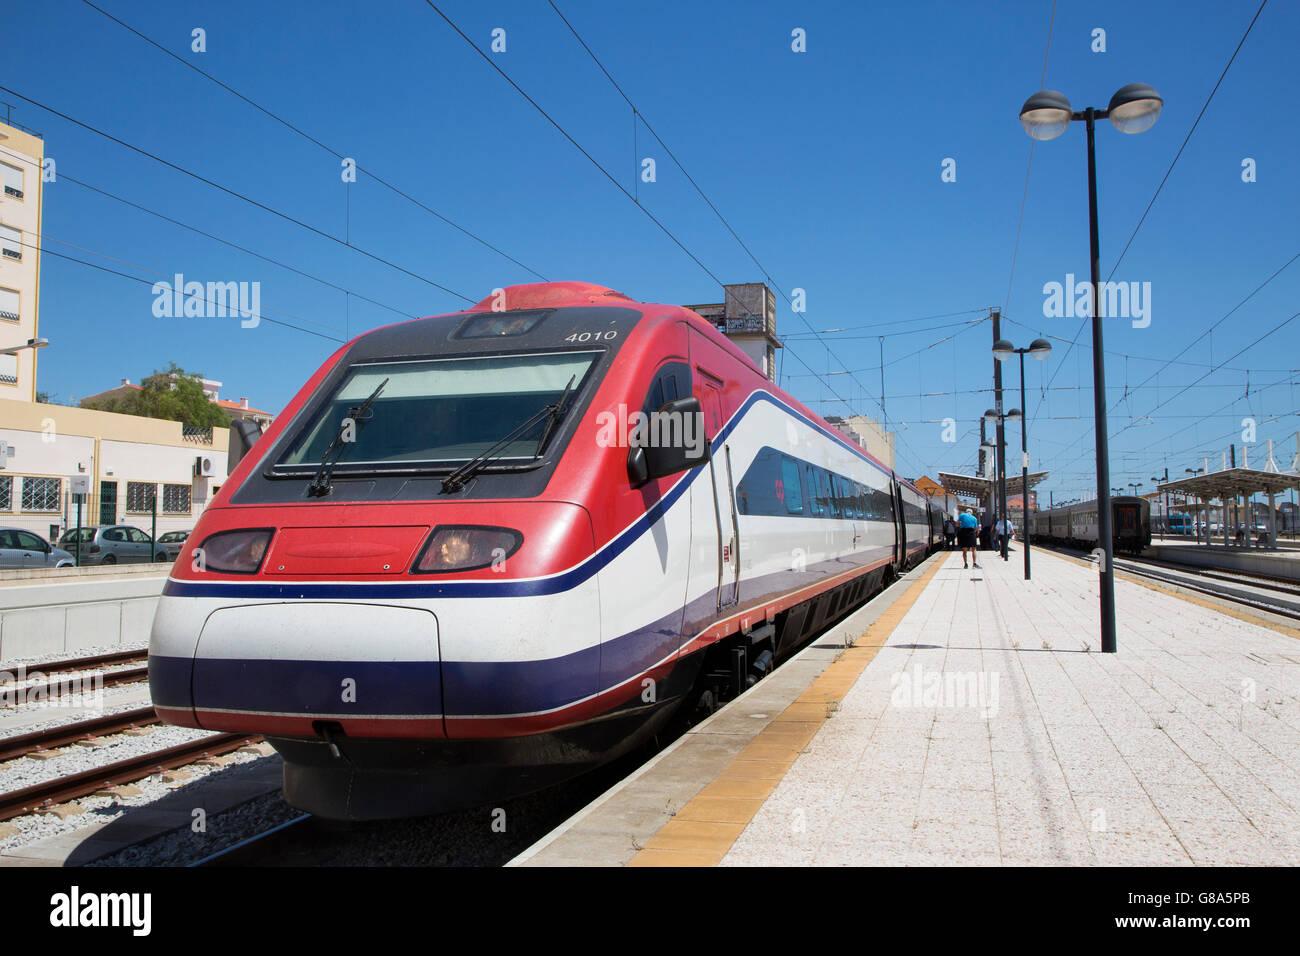 Hohe Geschwindigkeit Alfa Pendel kippen Zug am Bahnhof Melodien in der Algarve, Portugal Stockbild